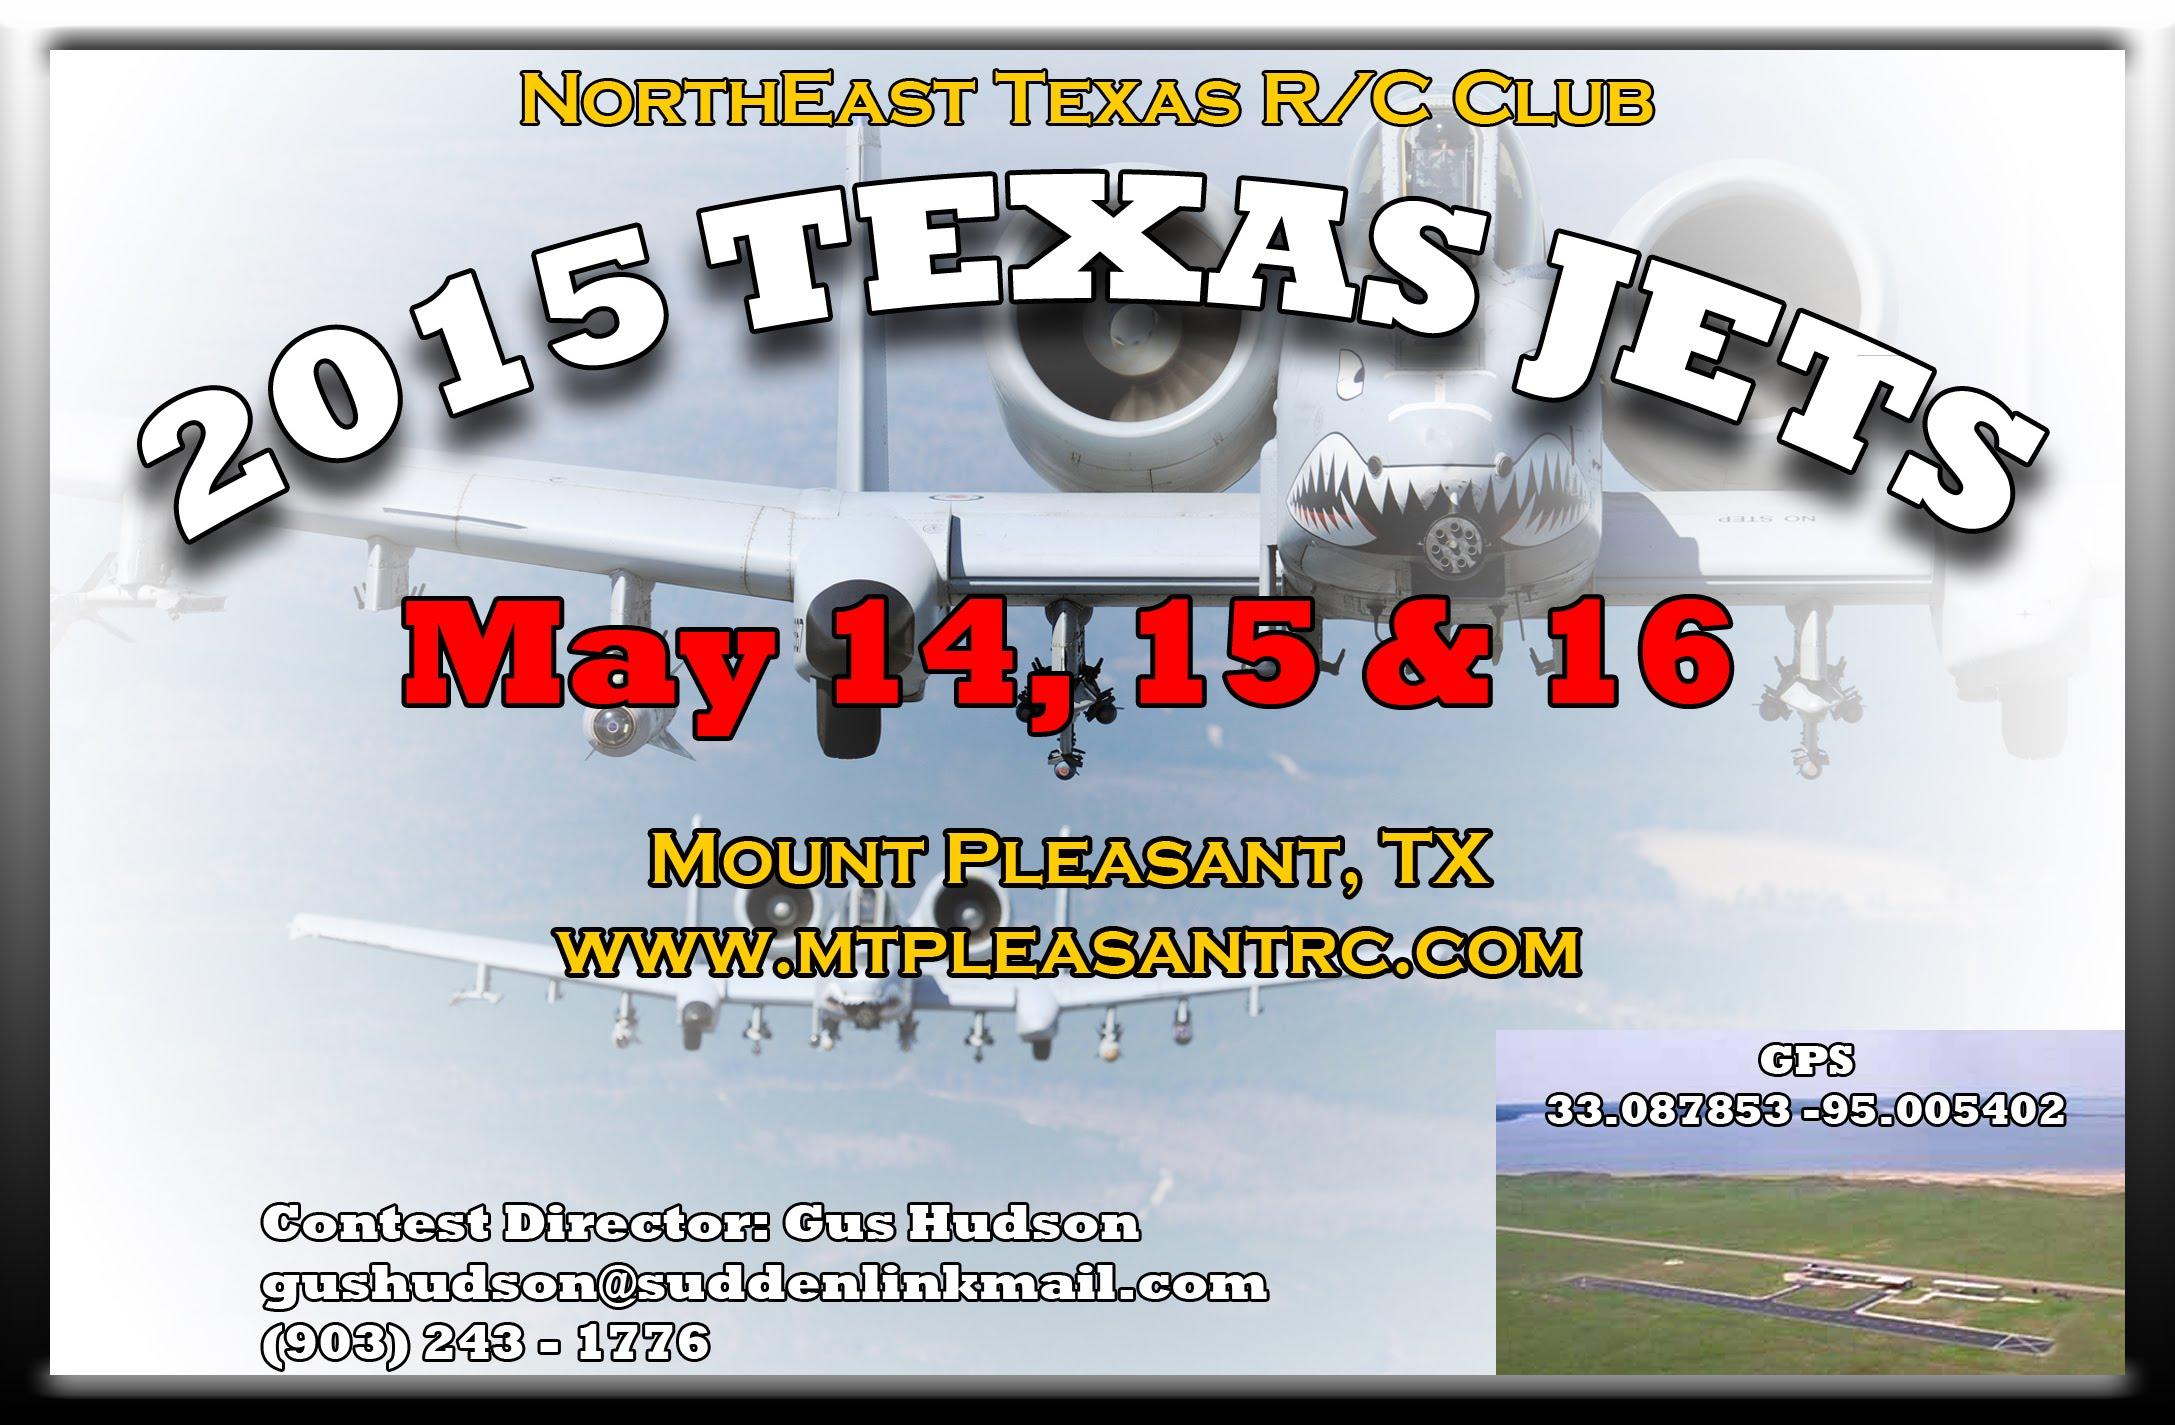 https://3332a5ee-a-ba82b423-s-sites.googlegroups.com/a/mtpleasantrc.com/northeast-texas-r-c-club/announcements/2013jetrally/2015%20Jet%20Rally.jpg?attachauth=ANoY7covwMeKFnek5a-fXz7fRK7ZZejh38g3ng1M4ZqfB4dhqPlZoZn64ekdcuVFGdHkehikU5fqXjwV3dPkREw8GPMvw1Q4npYQm92miMffOKq0E63ZYJALhvyK_gy_rOF8CF72L-hD8t0Mfe5VdCMeve-KG9WylOTuis41DXiR_rUYy66FGS7k2jQn0zt77ktFlSObHNFS4Oy35FAXXB73SnKQZfmsfkj0Vy2vkcwODNAjM9ZtScSGZ0TuRF2Fh1ZWj8WWYKufrFyU2JB4iAnJEvj8m6Lhww%3D%3D&attredirects=0